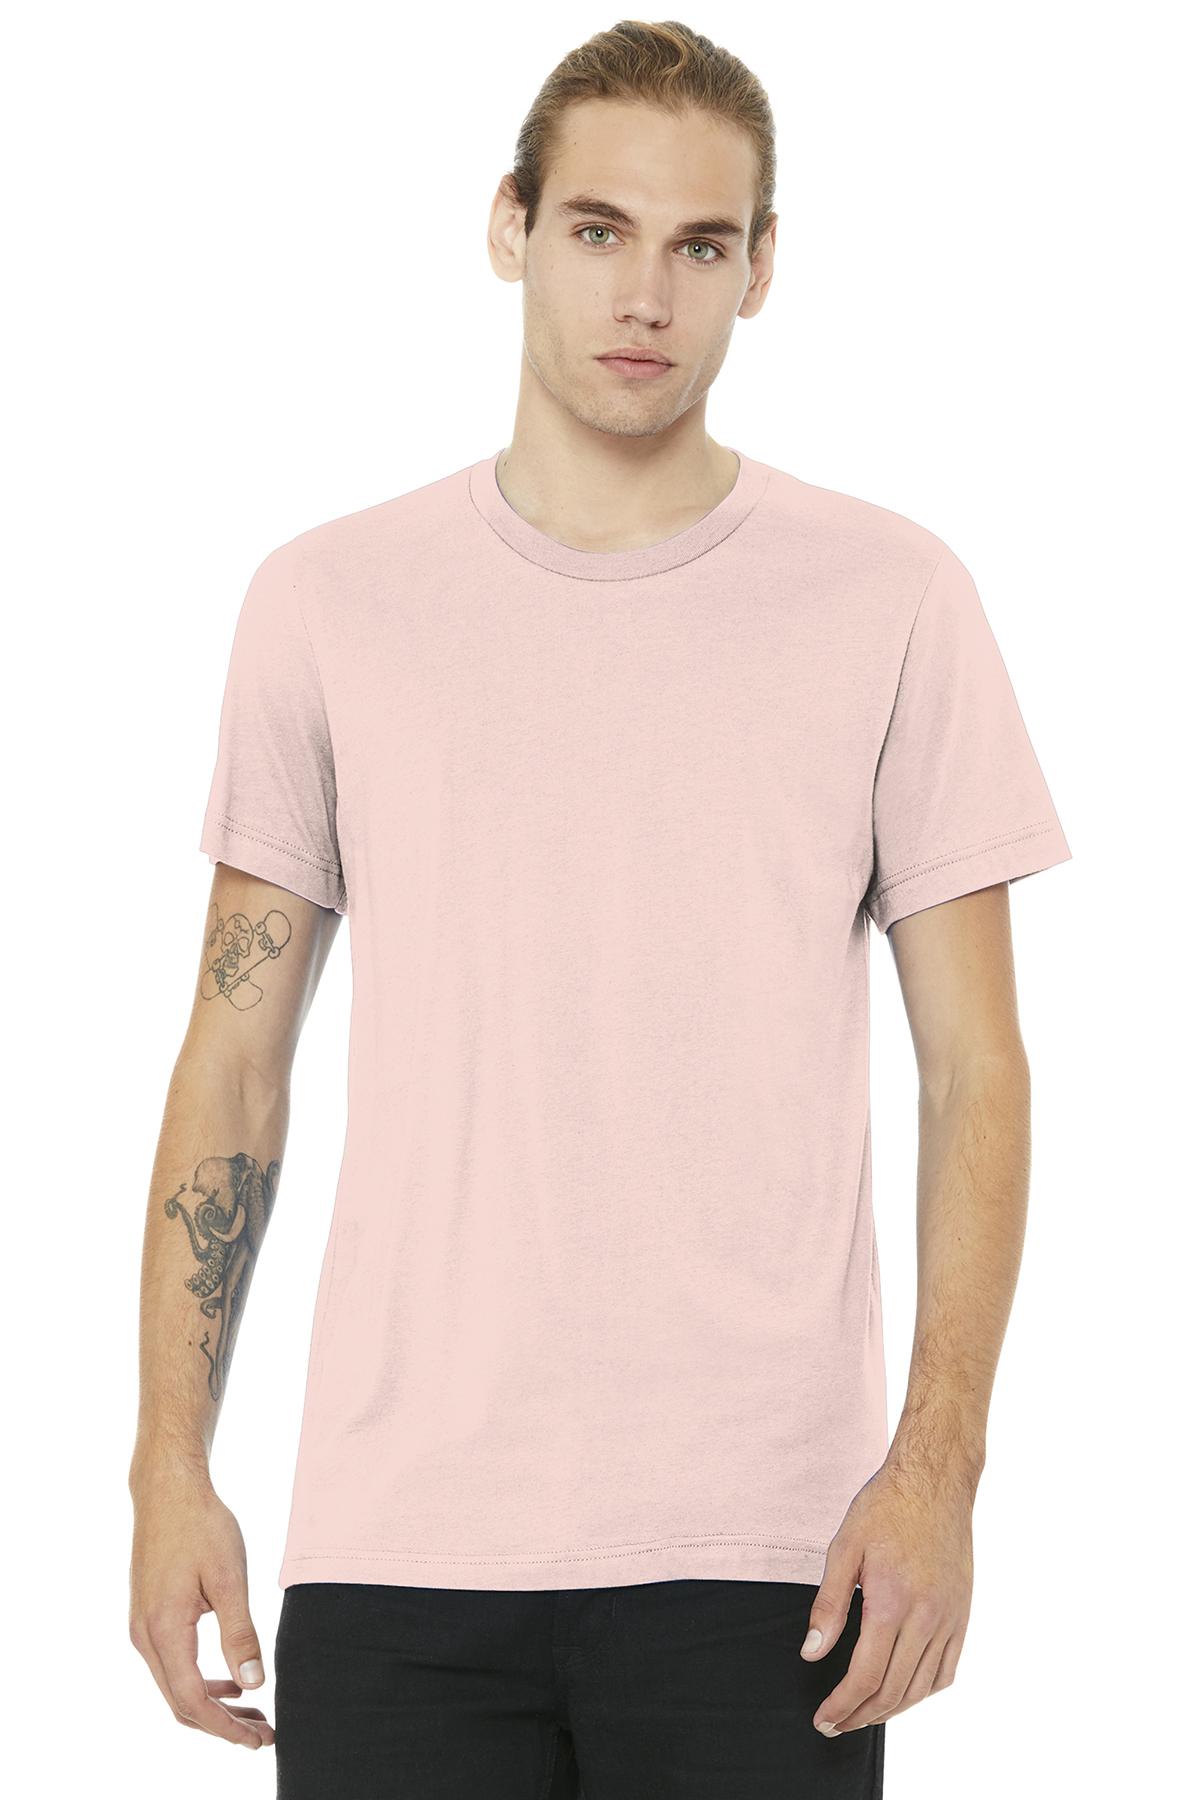 43ec18cff4d69 BELLA+CANVAS ® Unisex Jersey Short Sleeve Tee | Adult/Men | T ...